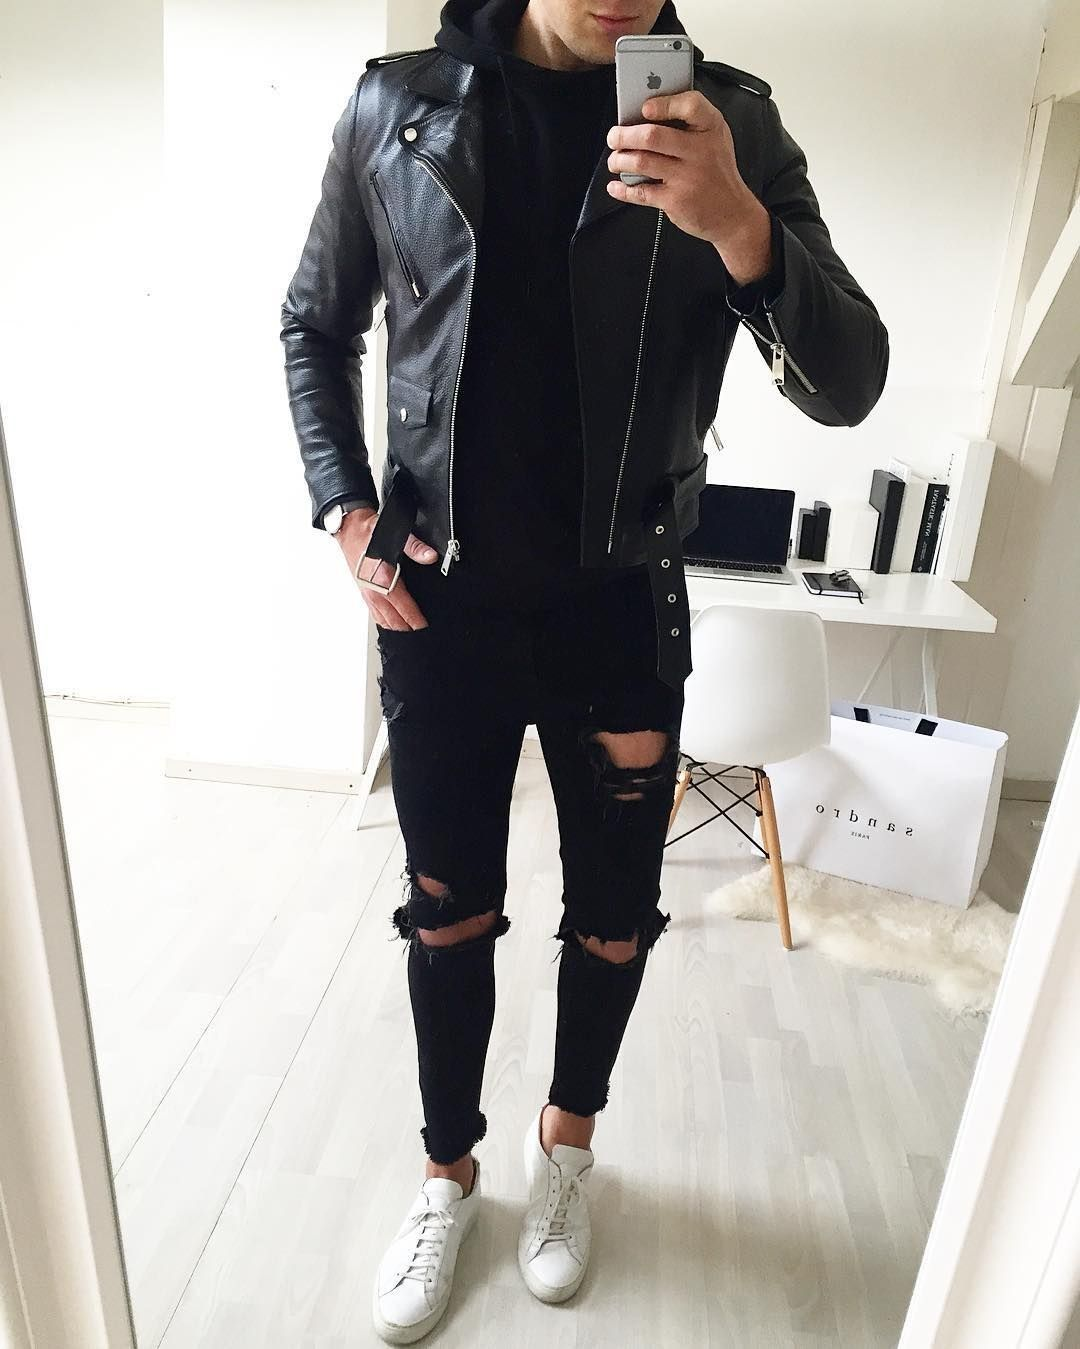 New And Improved Badass Deku Story Ripped Jeans Men White Jeans Men Ripped Jeans Outfit [ 1349 x 1080 Pixel ]